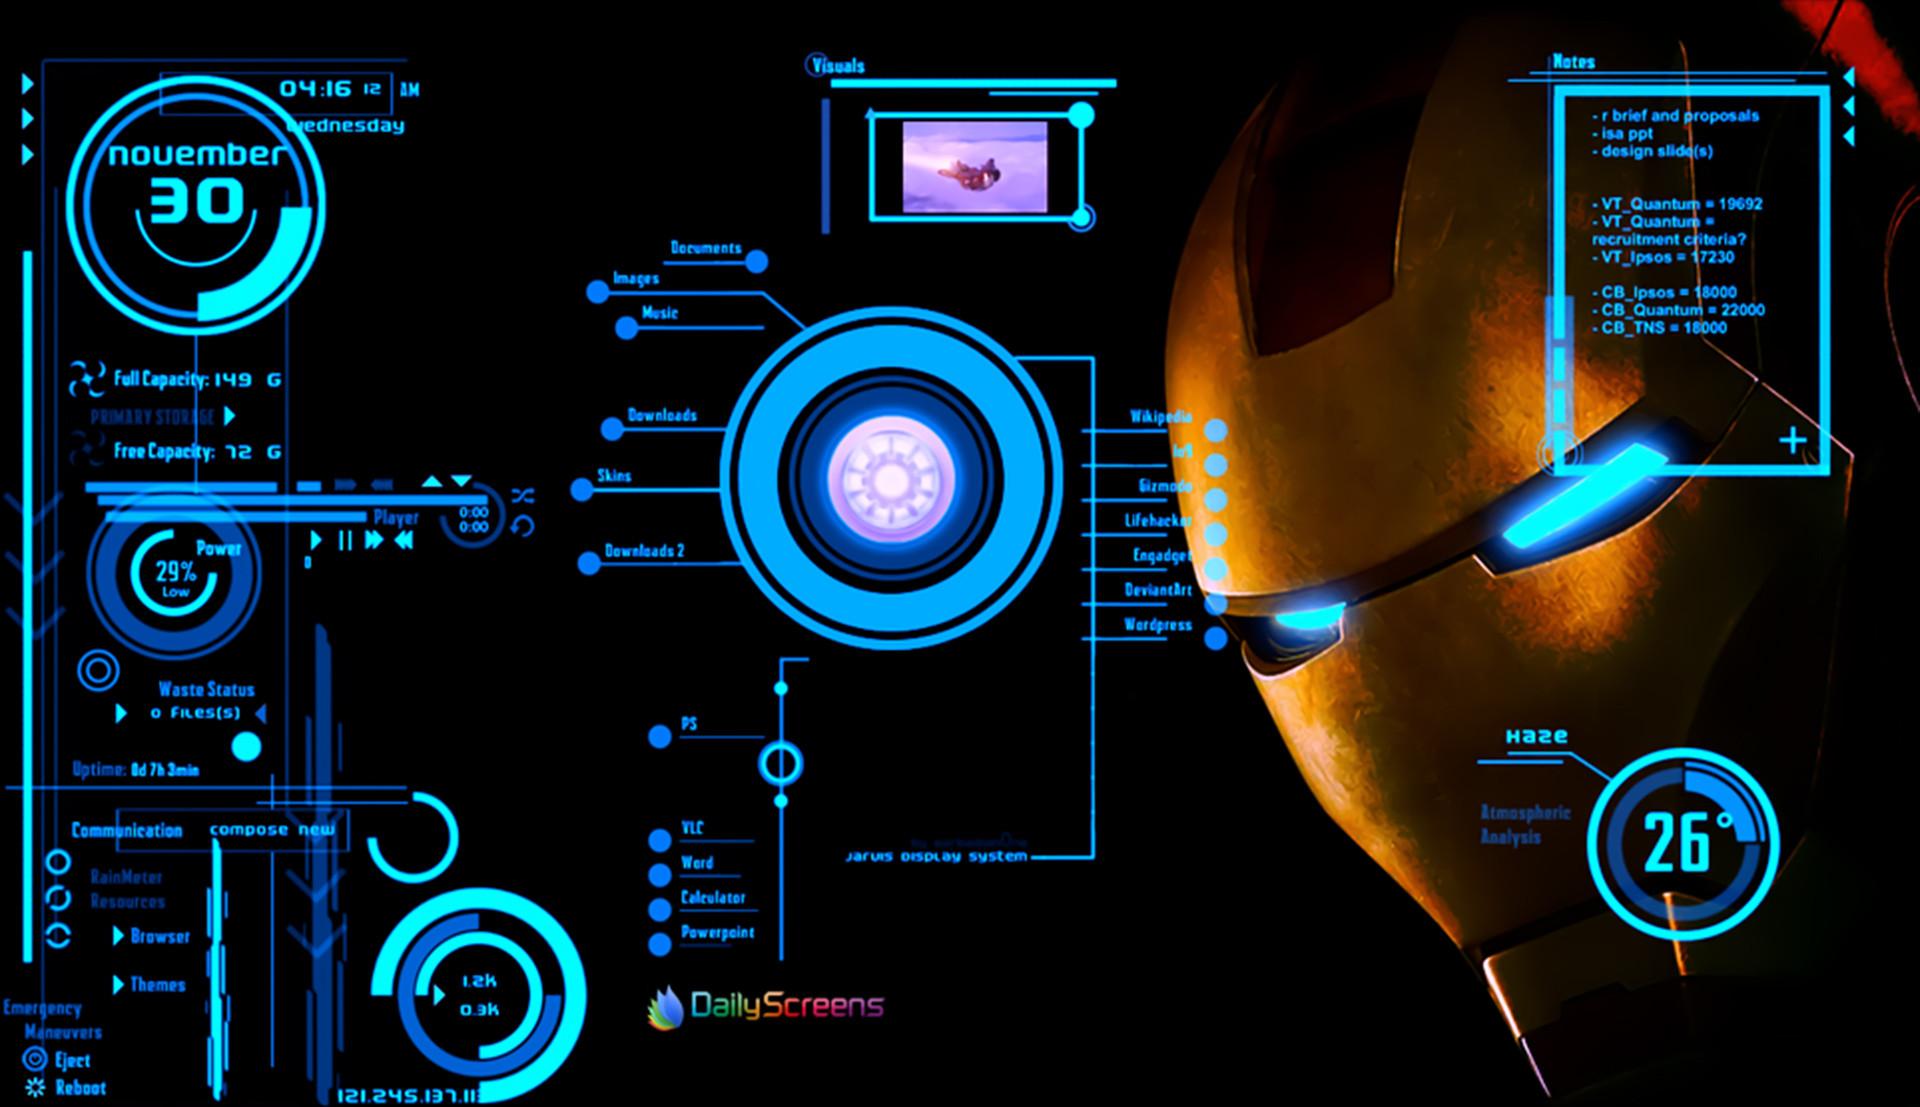 Iron Man 3 Jarvis #6988186